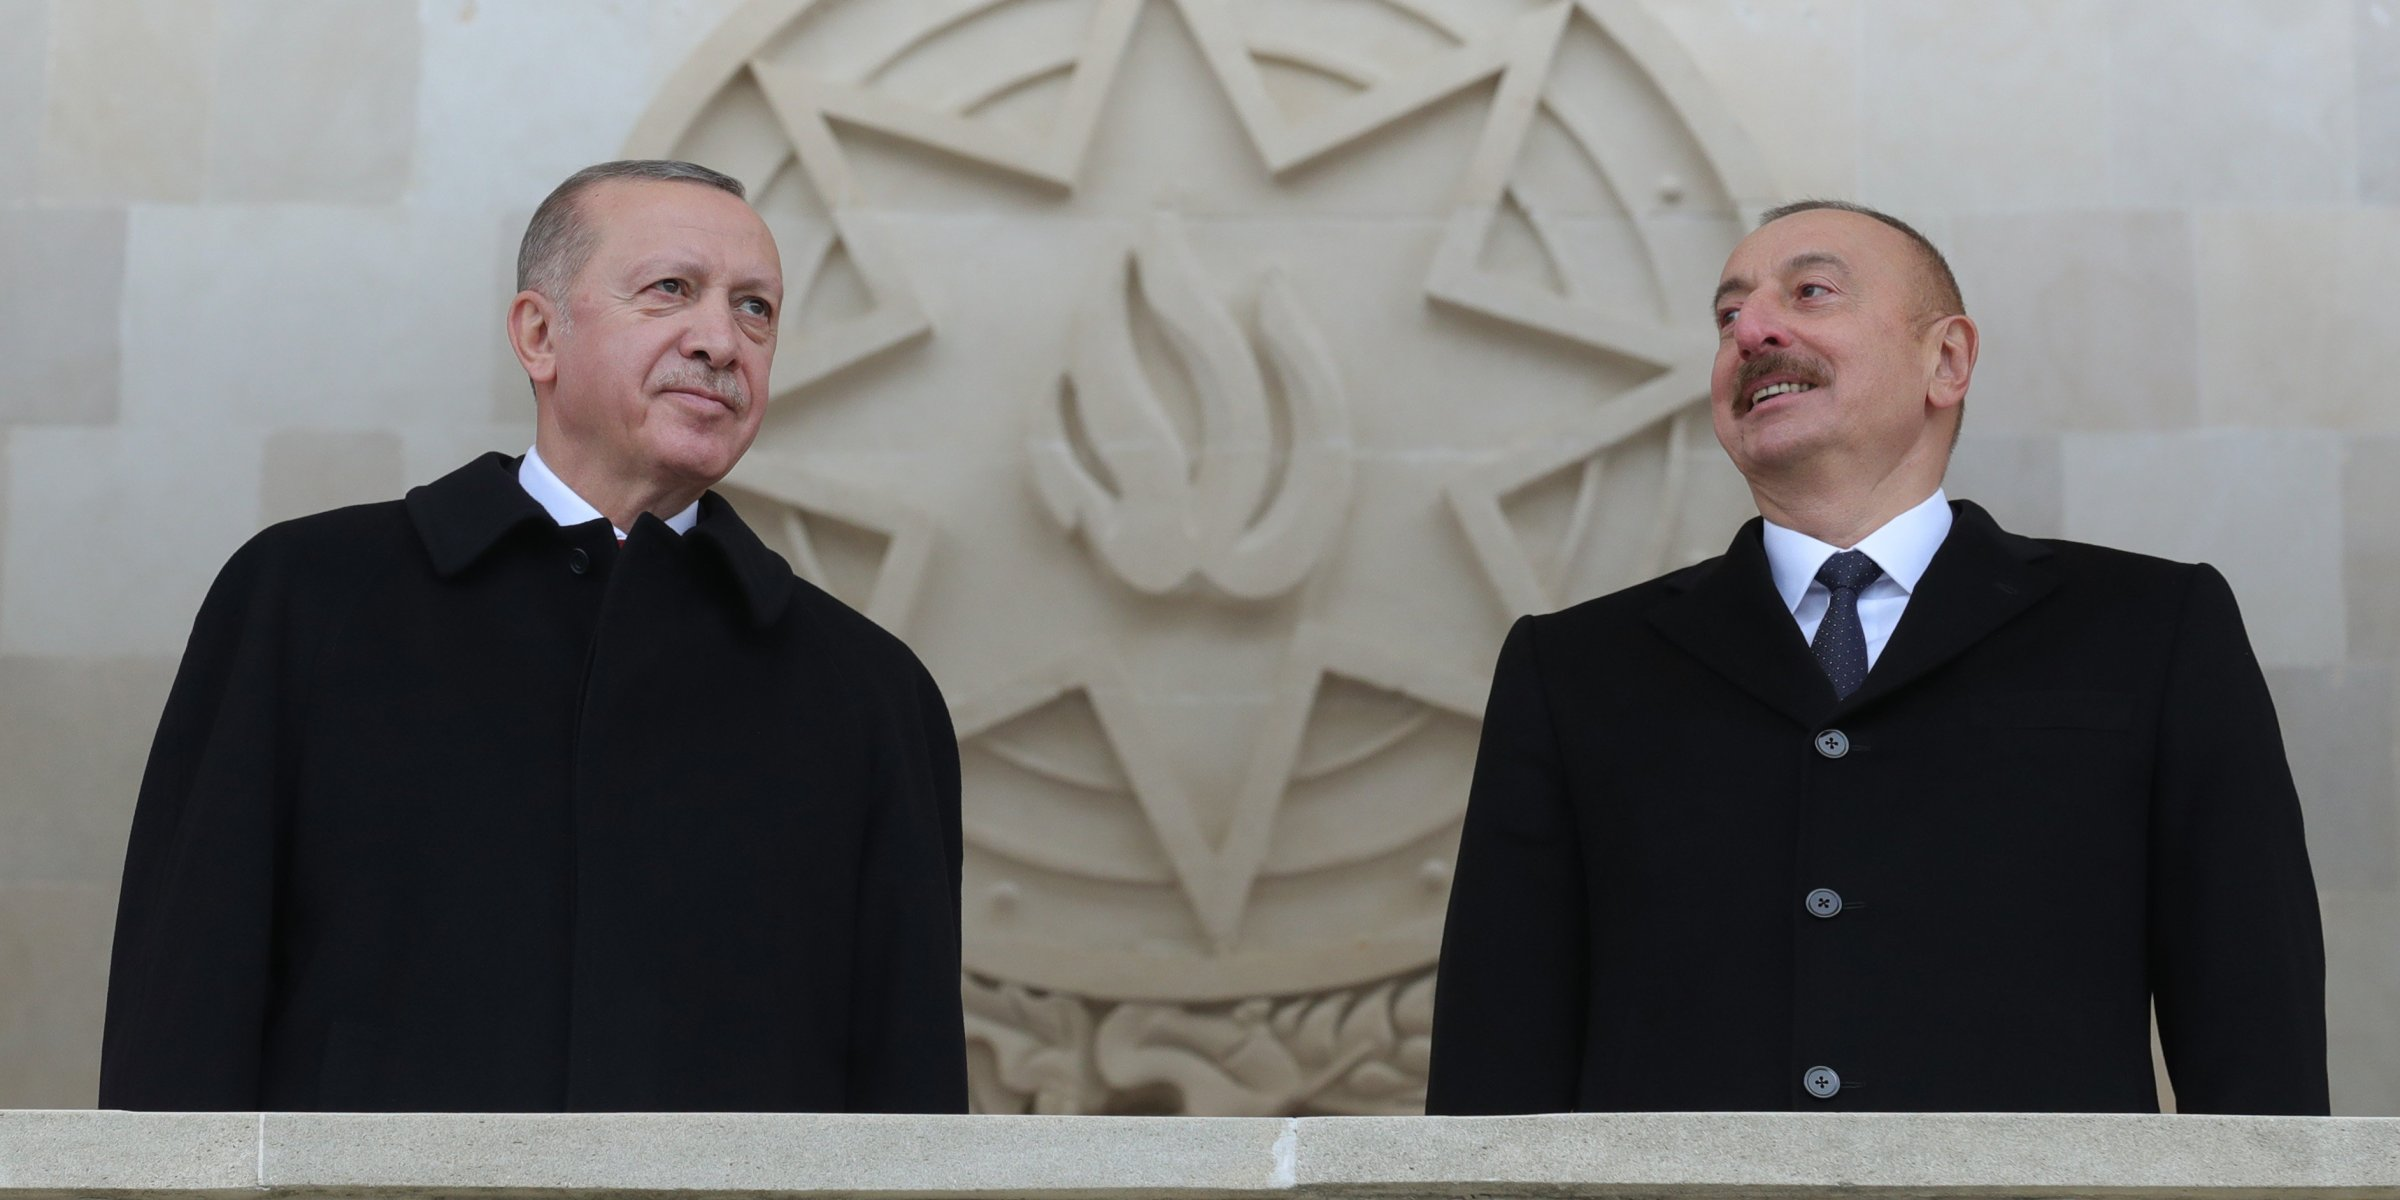 Erdoğan, Aliyev discuss bilateral relations in phone call